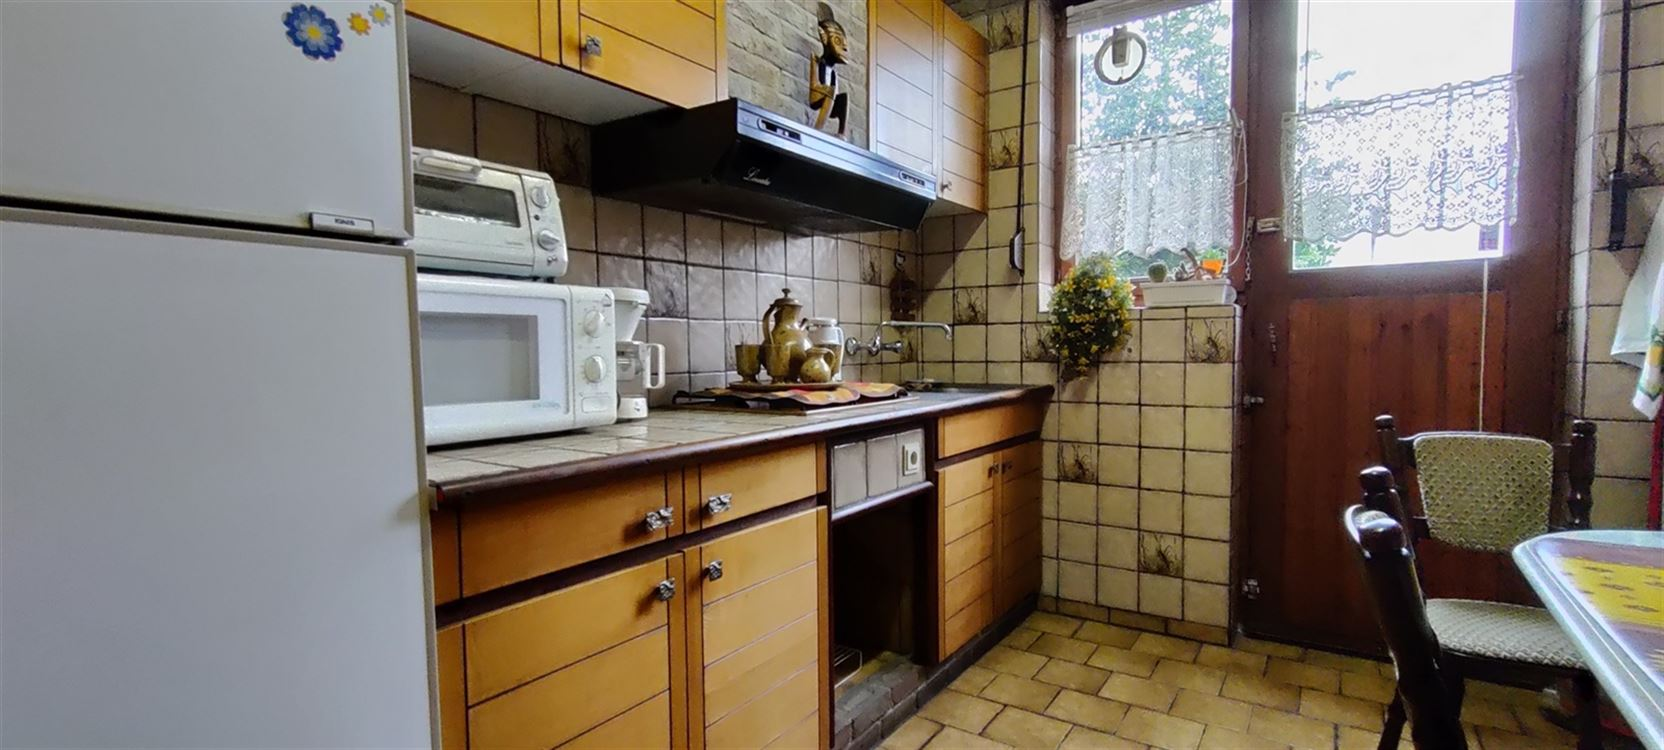 Foto 5 : Huis te 1420 BRAINE-L'ALLEUD (België) - Prijs € 335.000